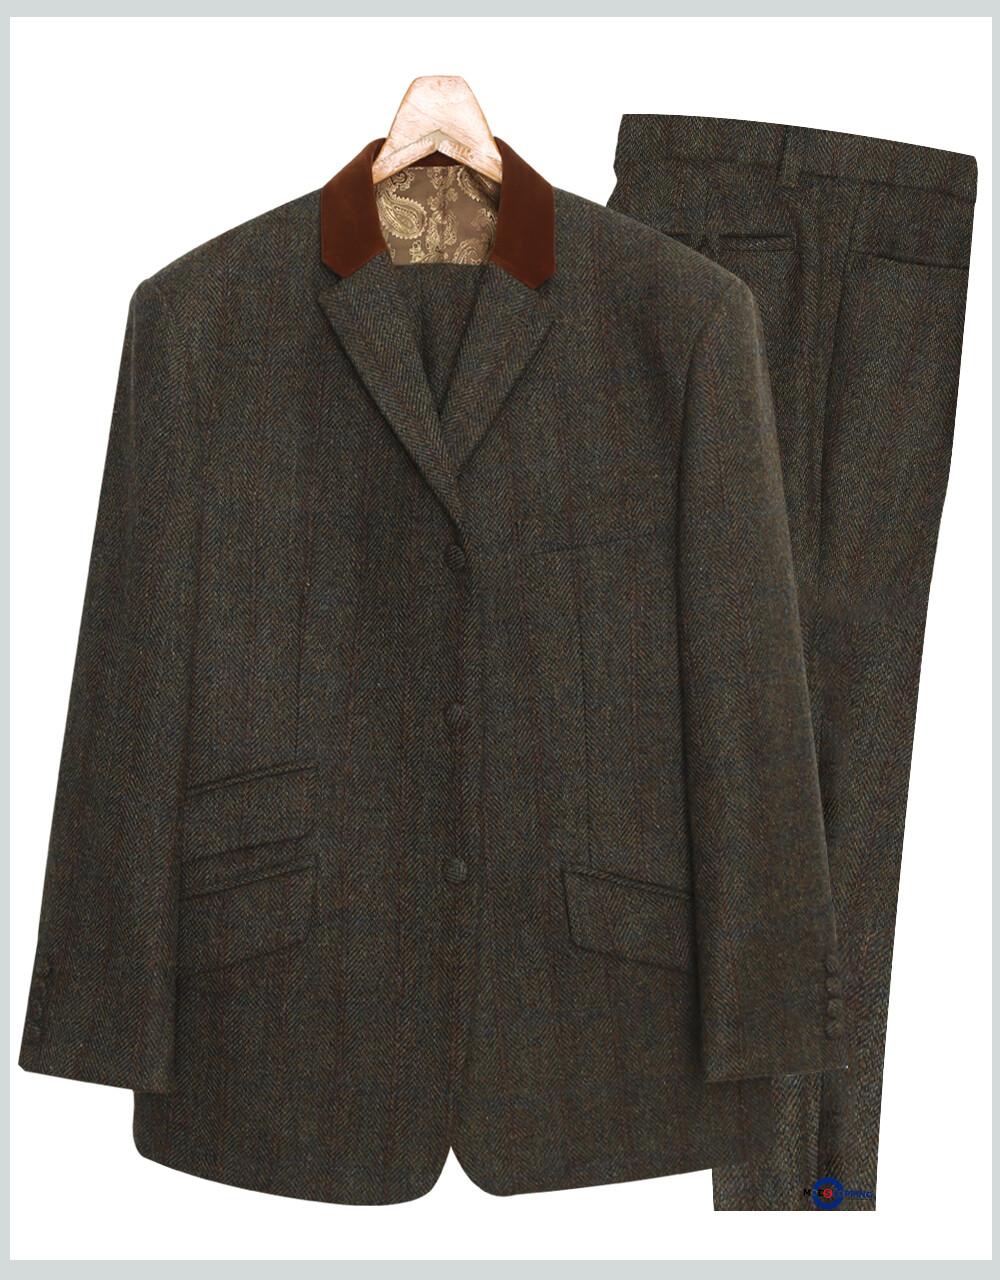 Men's 3 Piece Suit | Army Green Color Tweed Suit